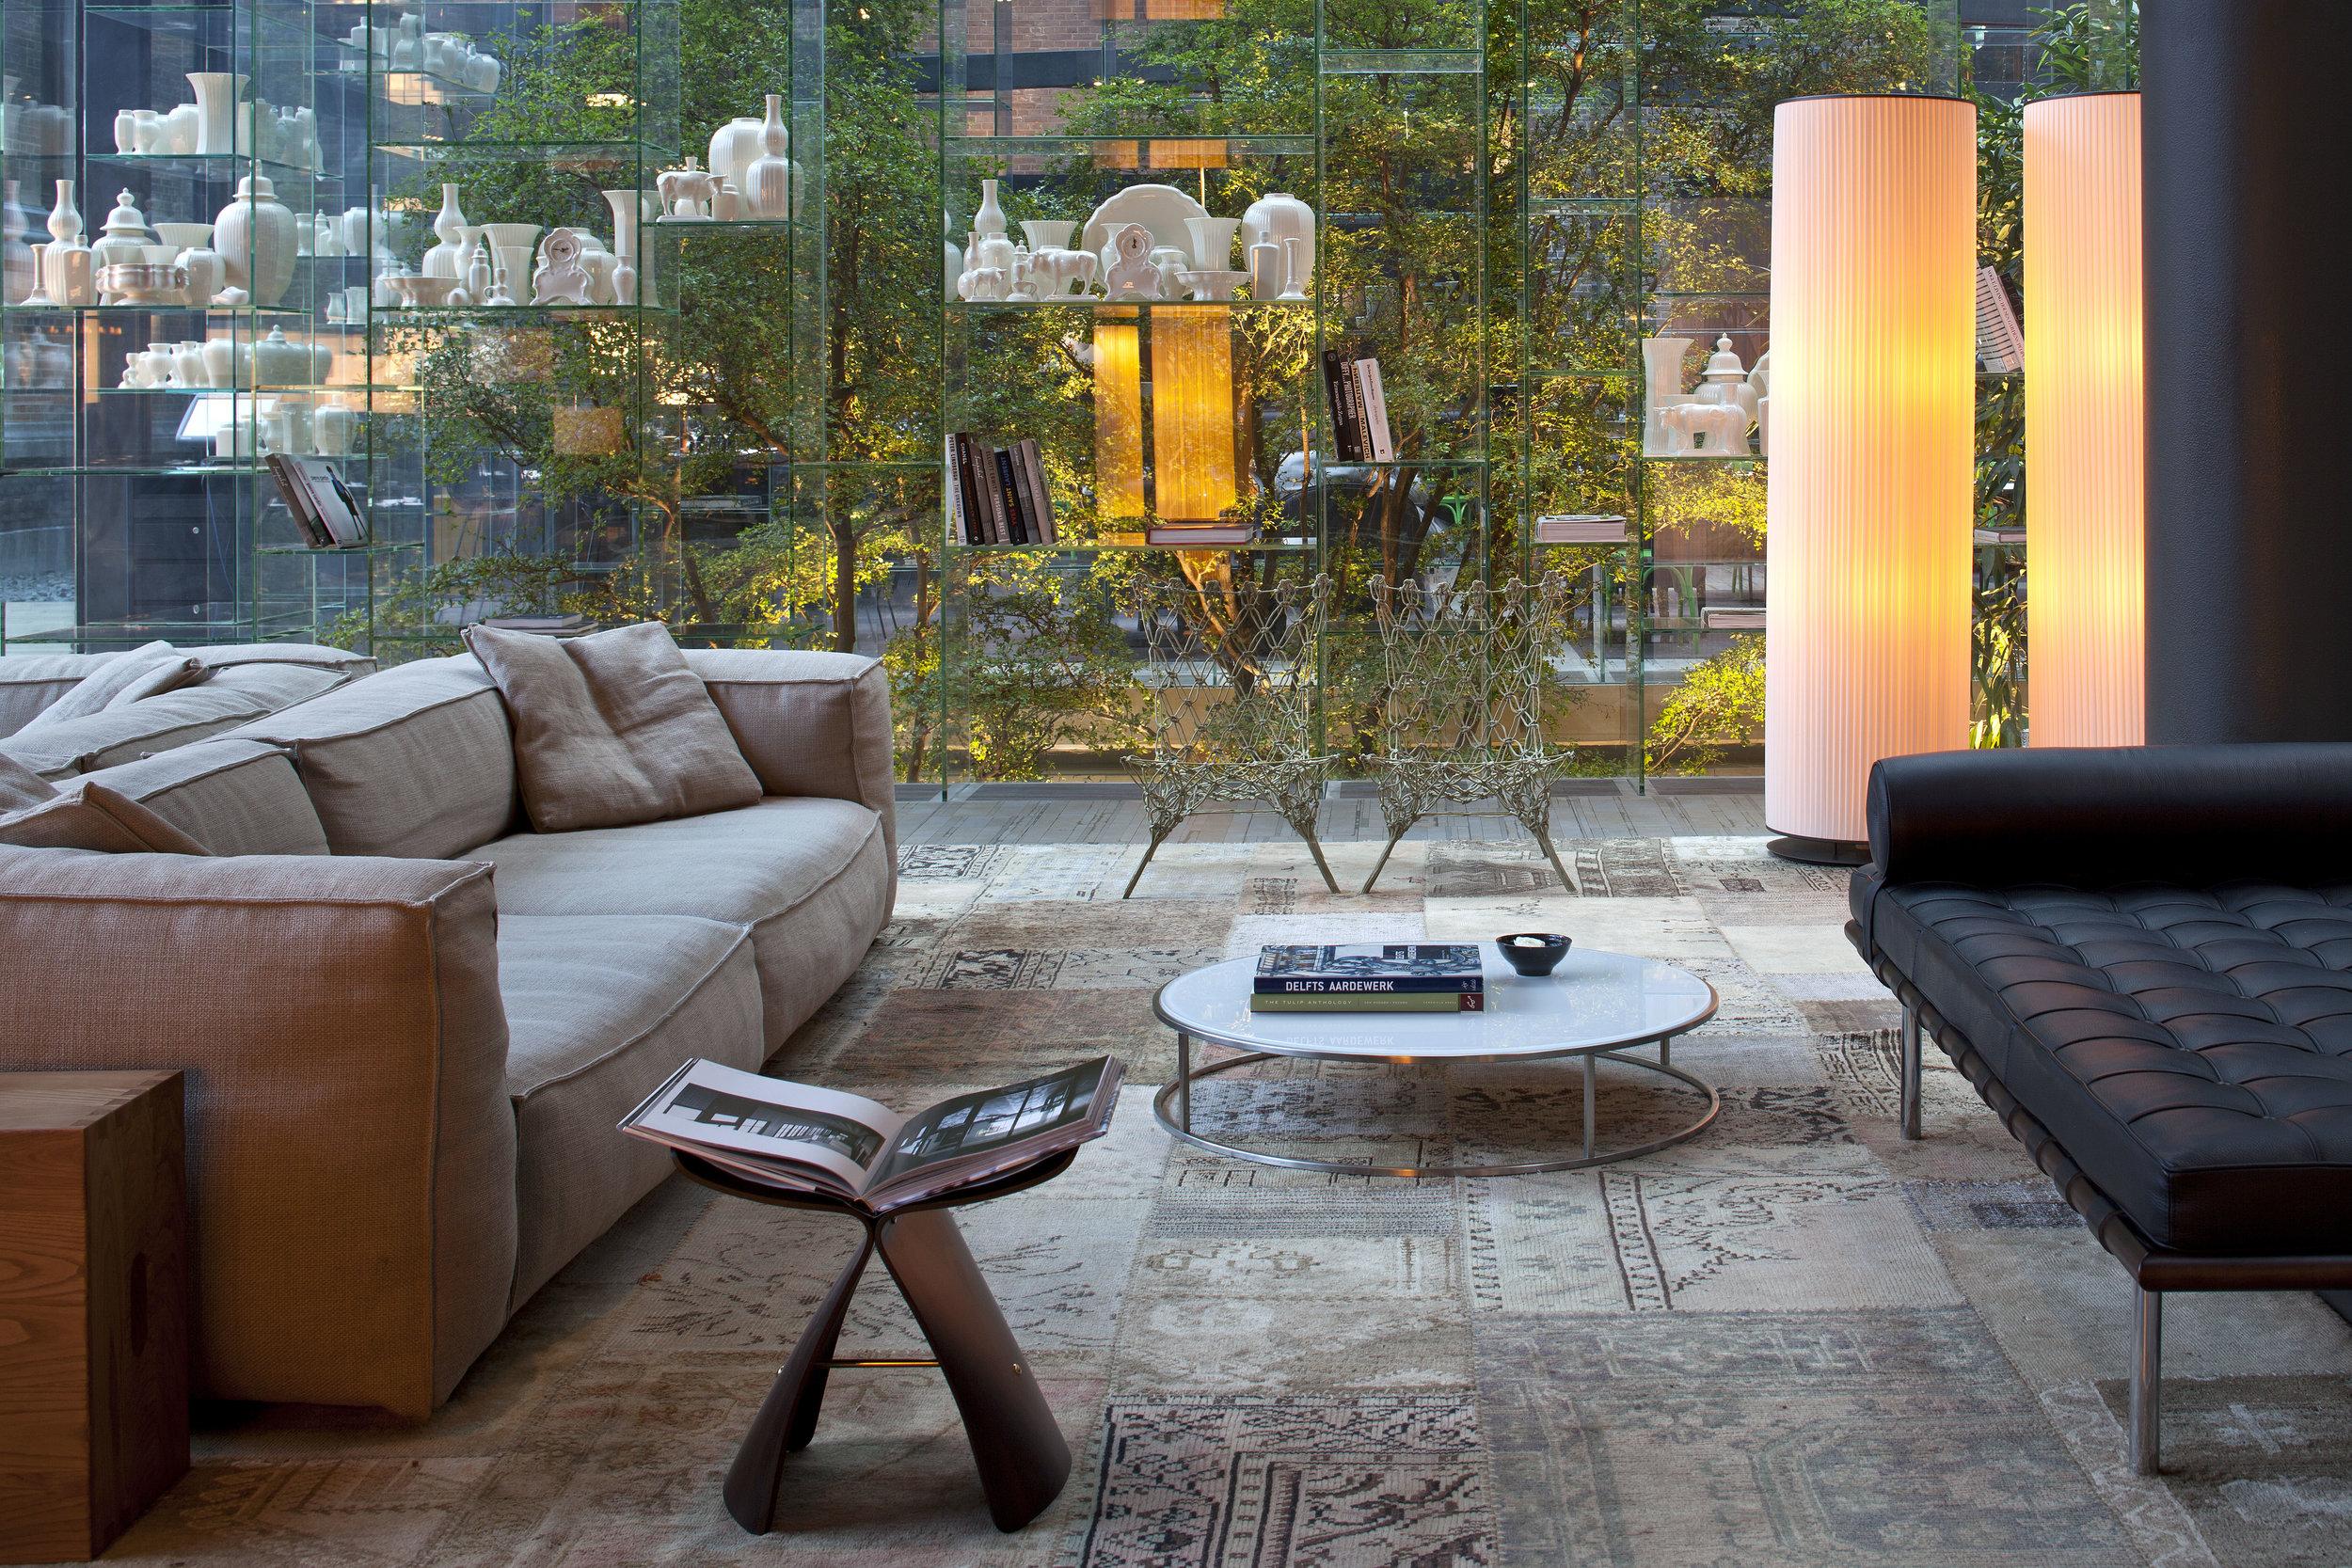 Conservatorium Hotel Lounge 2.jpg